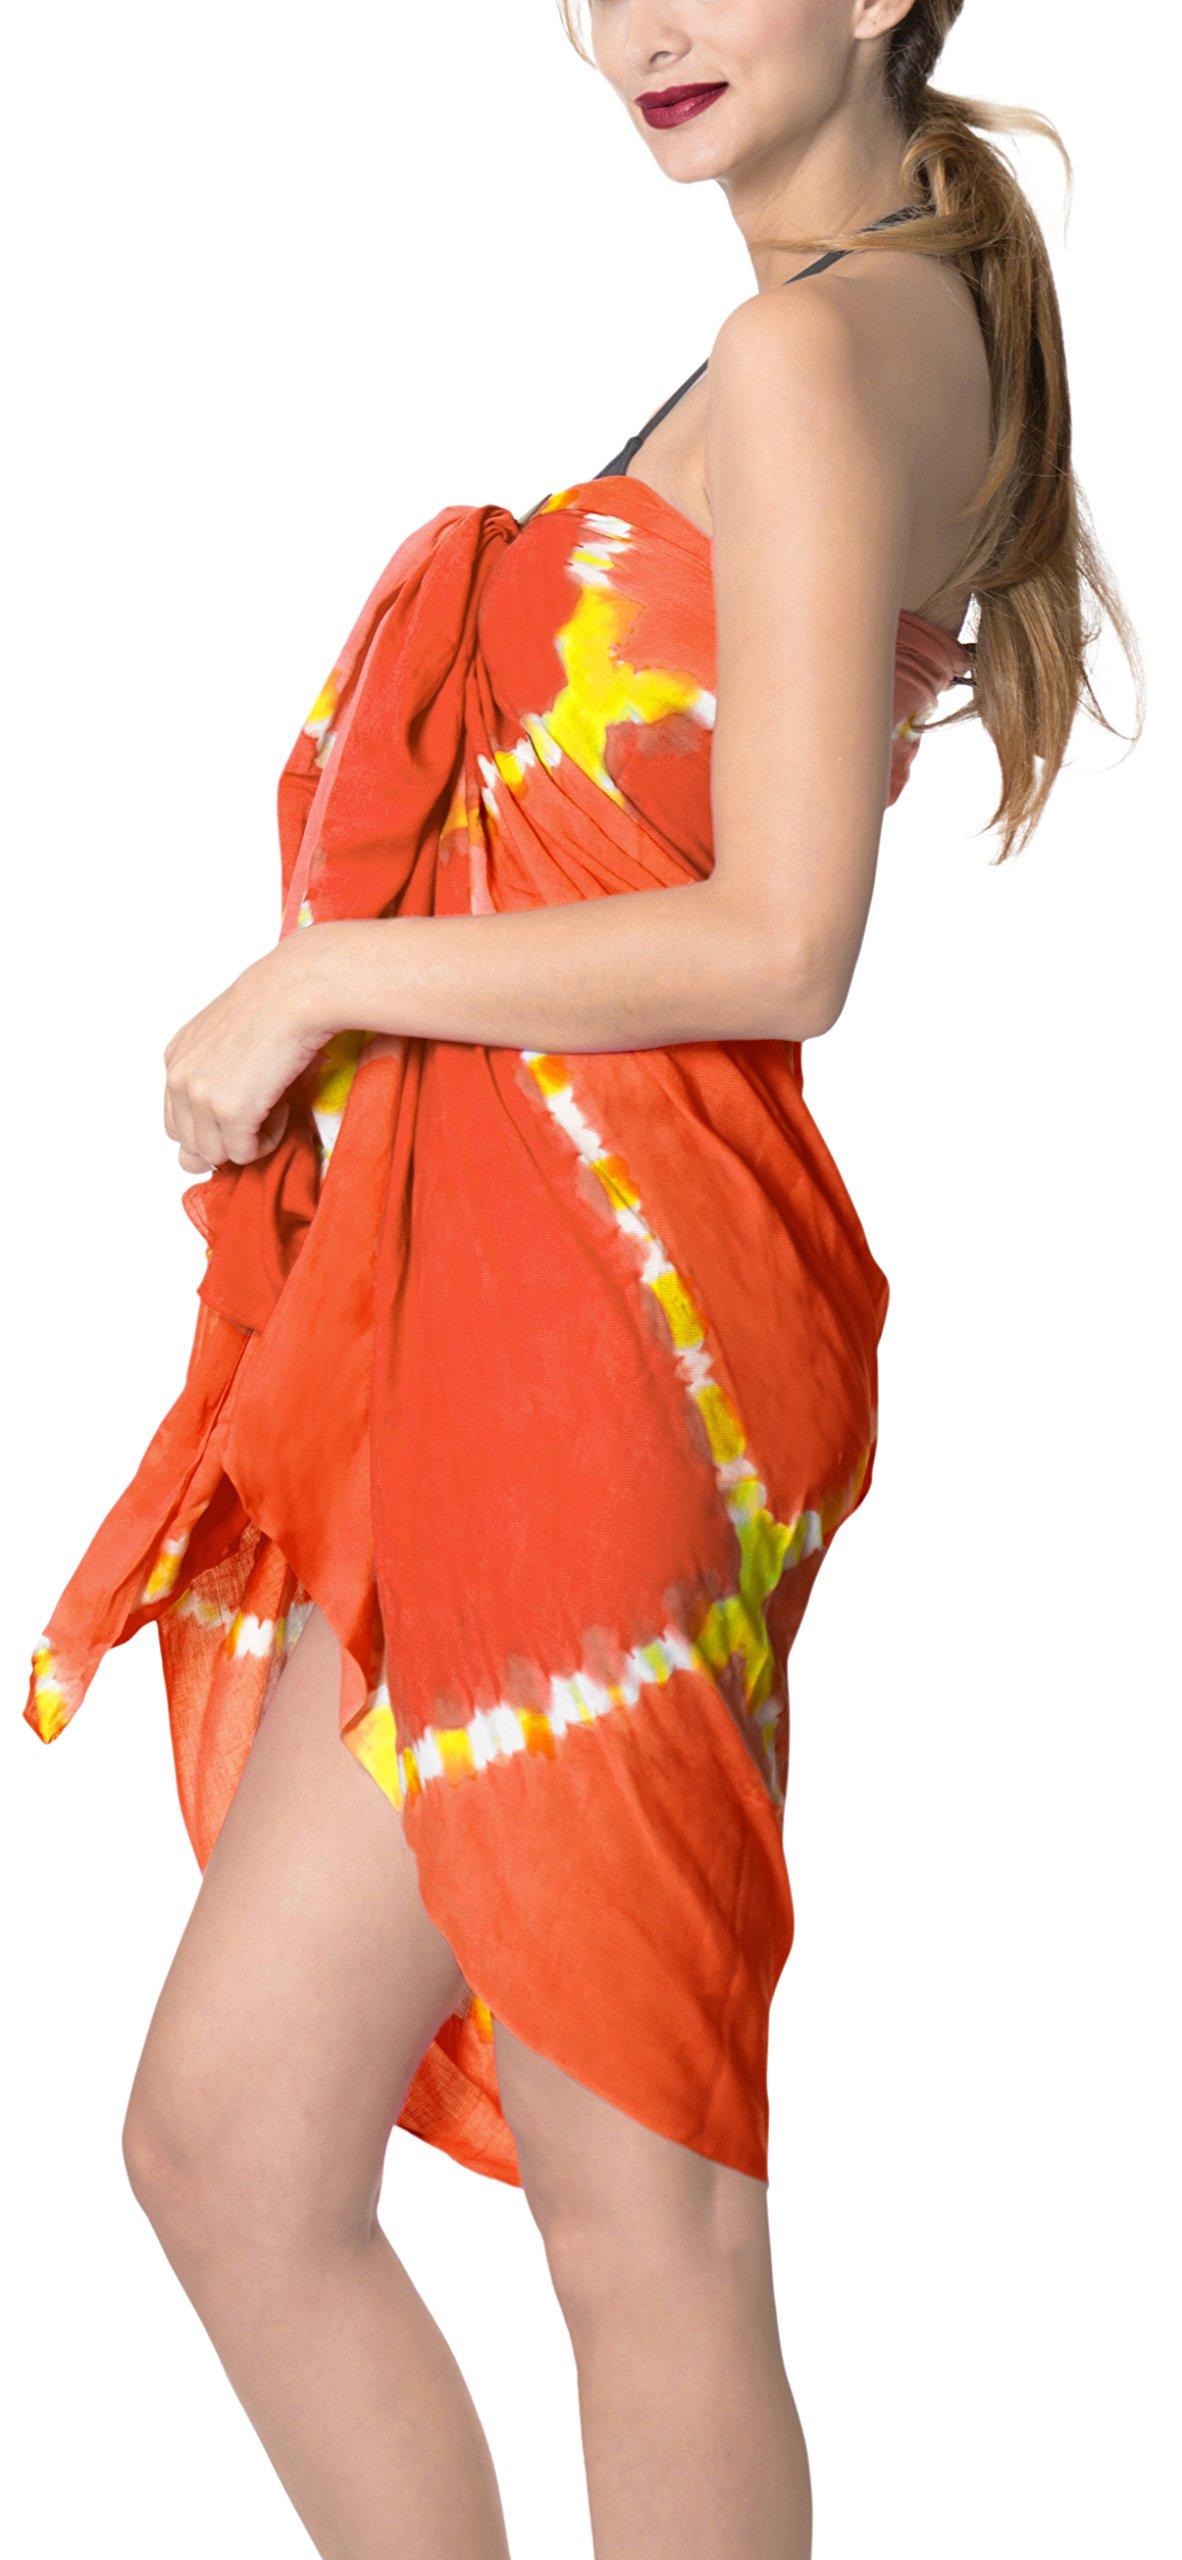 LA LEELA Rayon Costumi da Bagno Involucro Pareo Avvolgere Lungo Sarong Tie Dye 3 spesavip